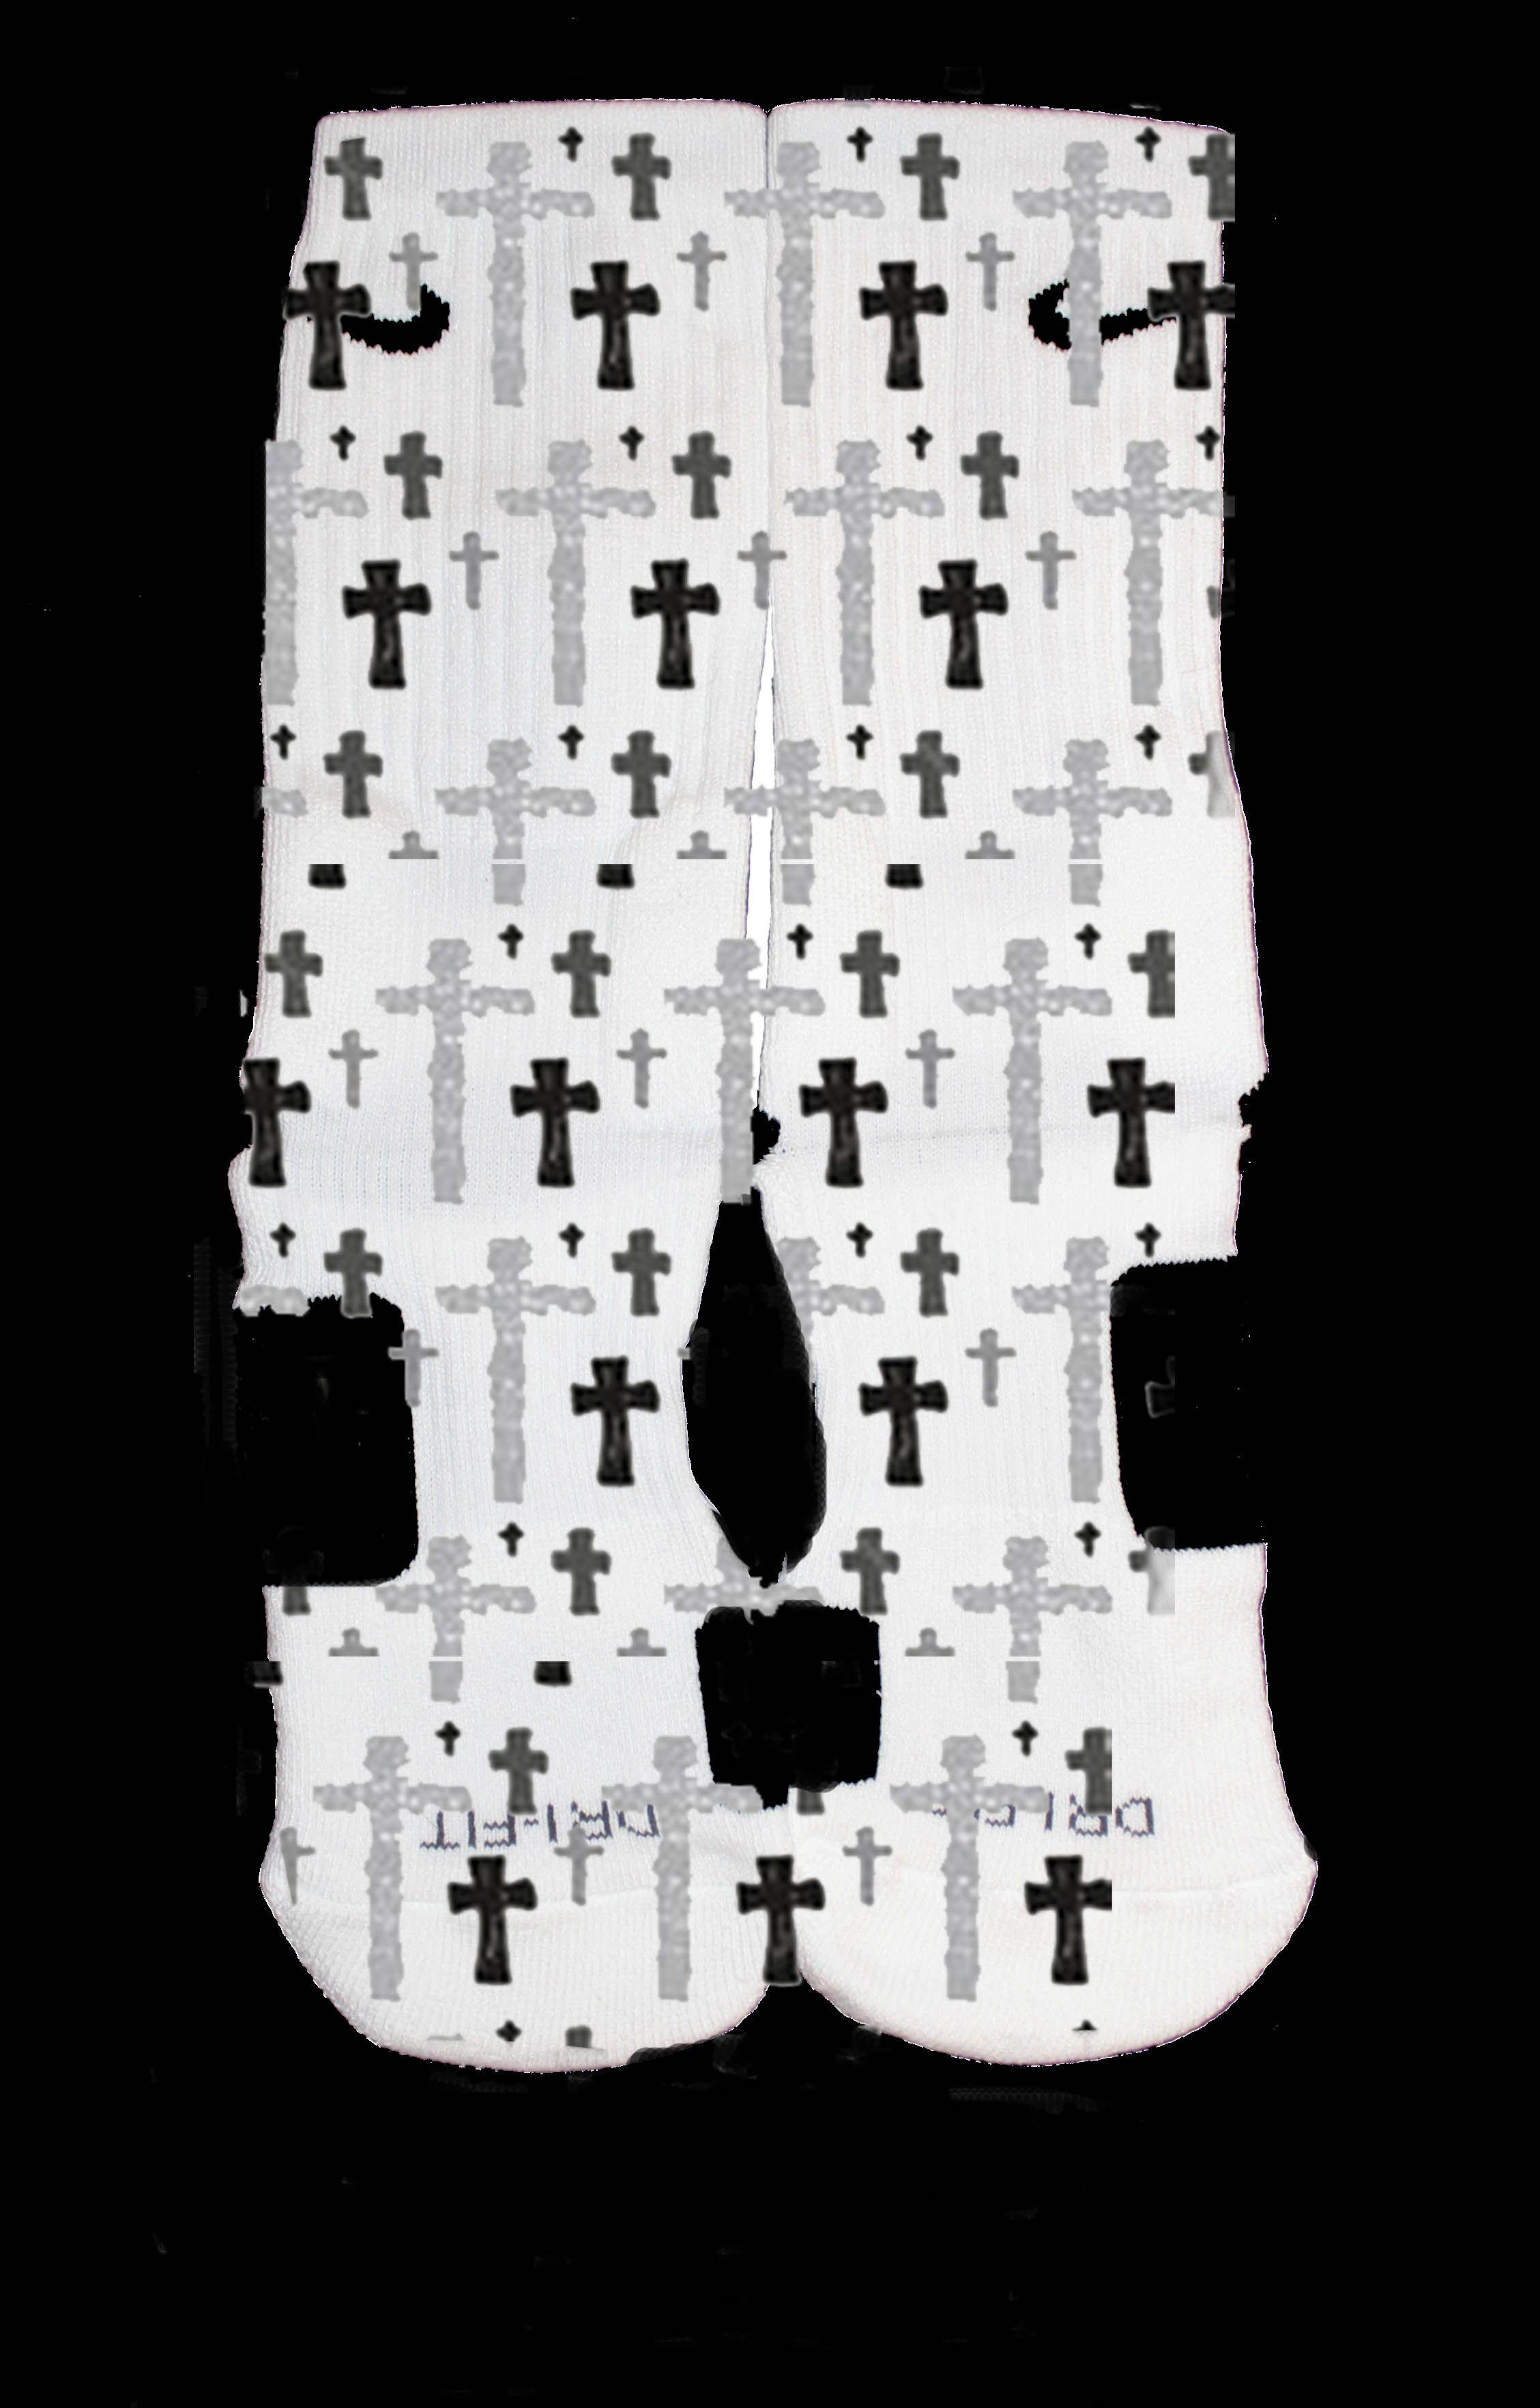 The Sickest Socks New Cross Nike Custom Elites Nike Socks Adidas Shoes Women Cute Socks